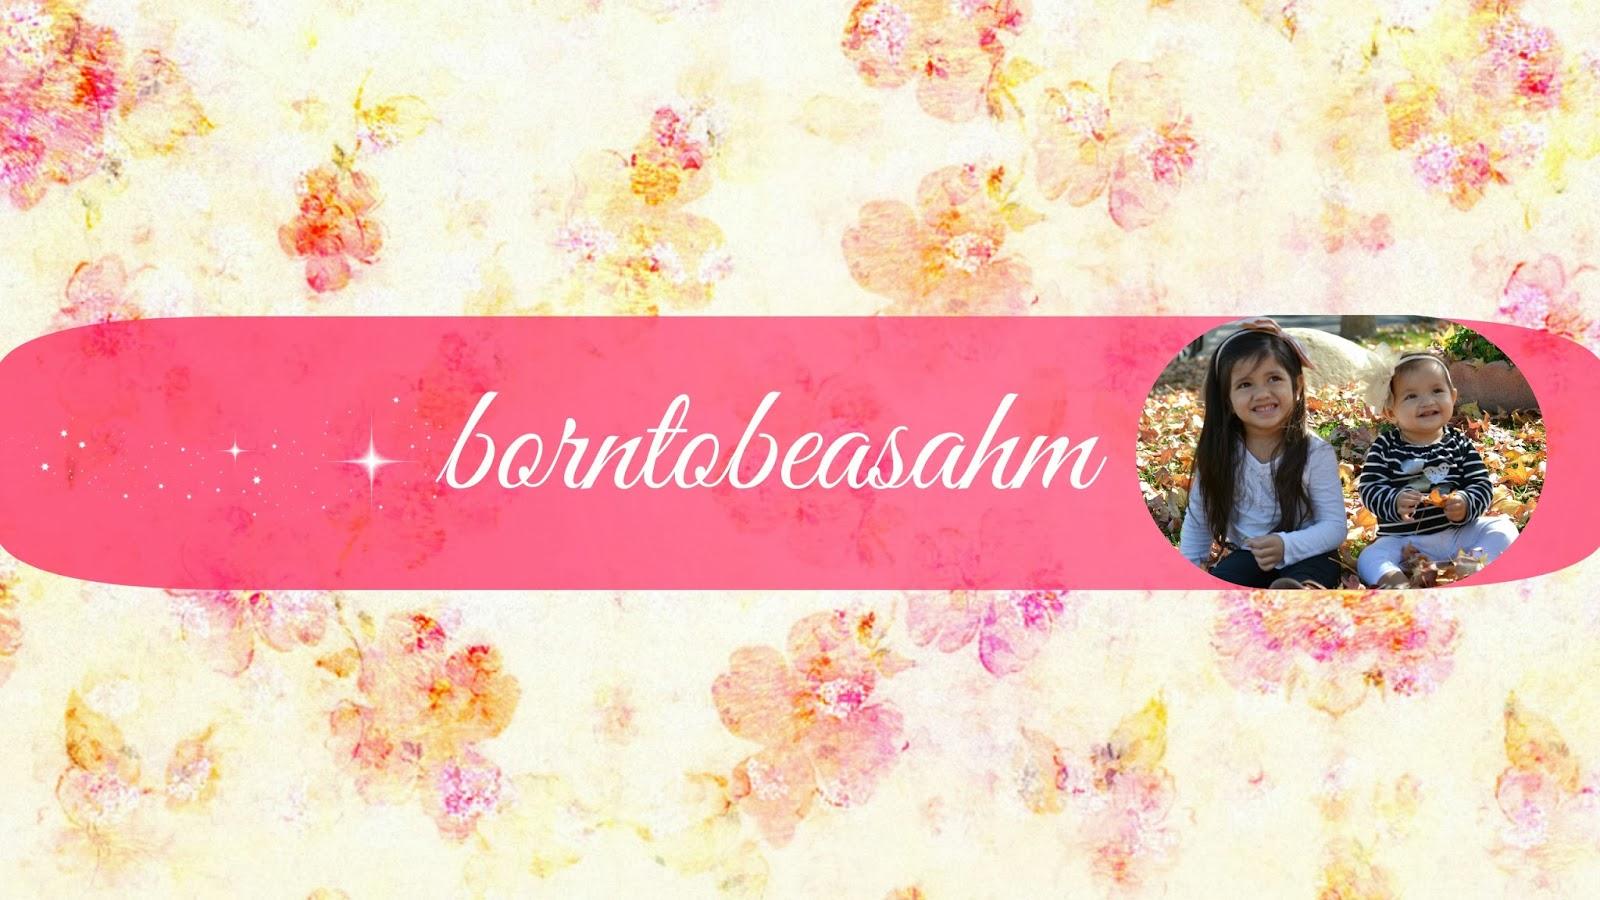 youtube.com/borntobeasahm